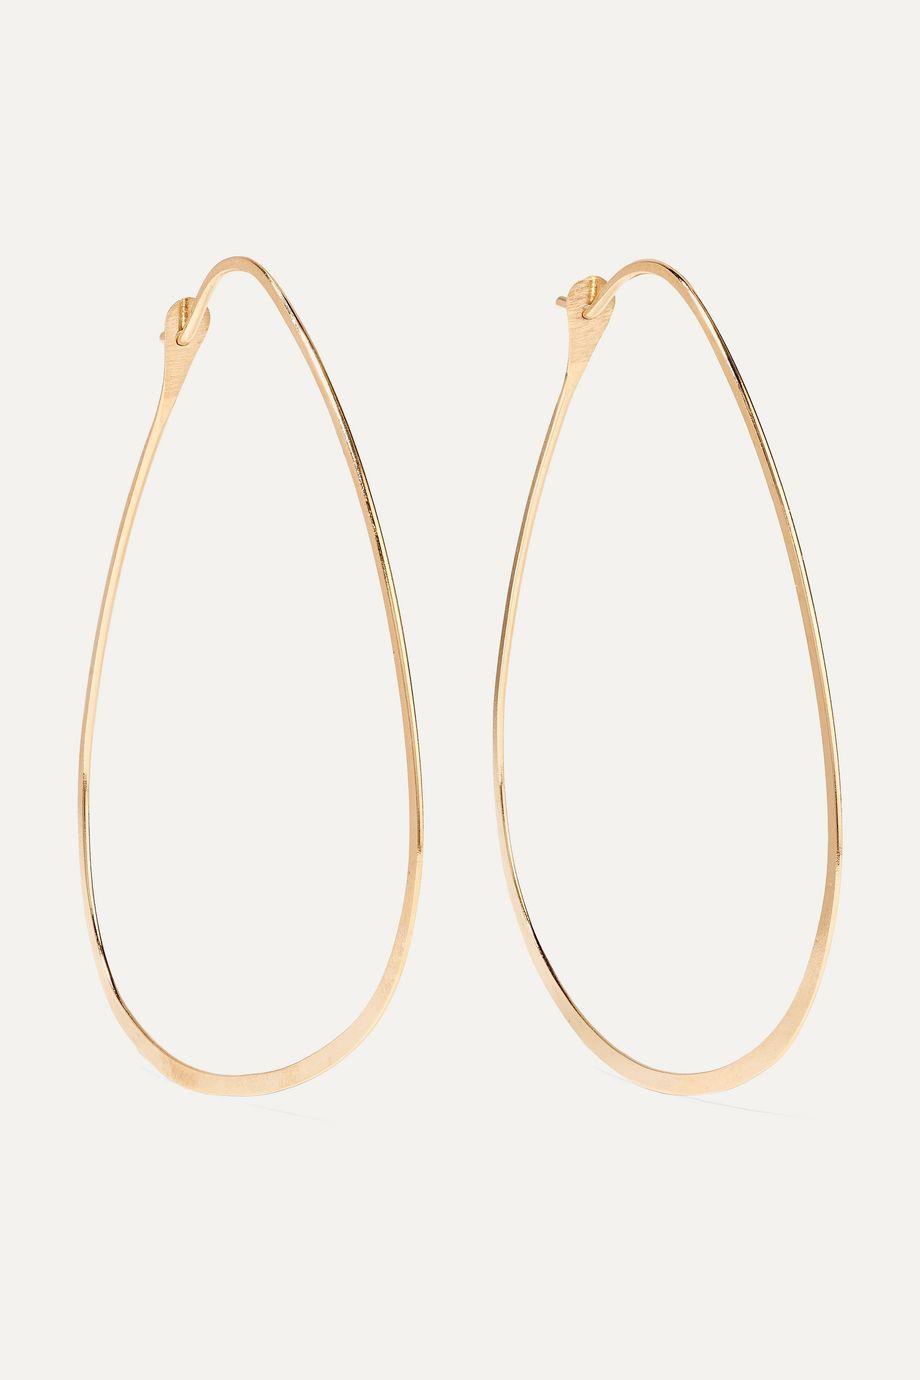 Melissa Joy Manning Gold hoop earrings